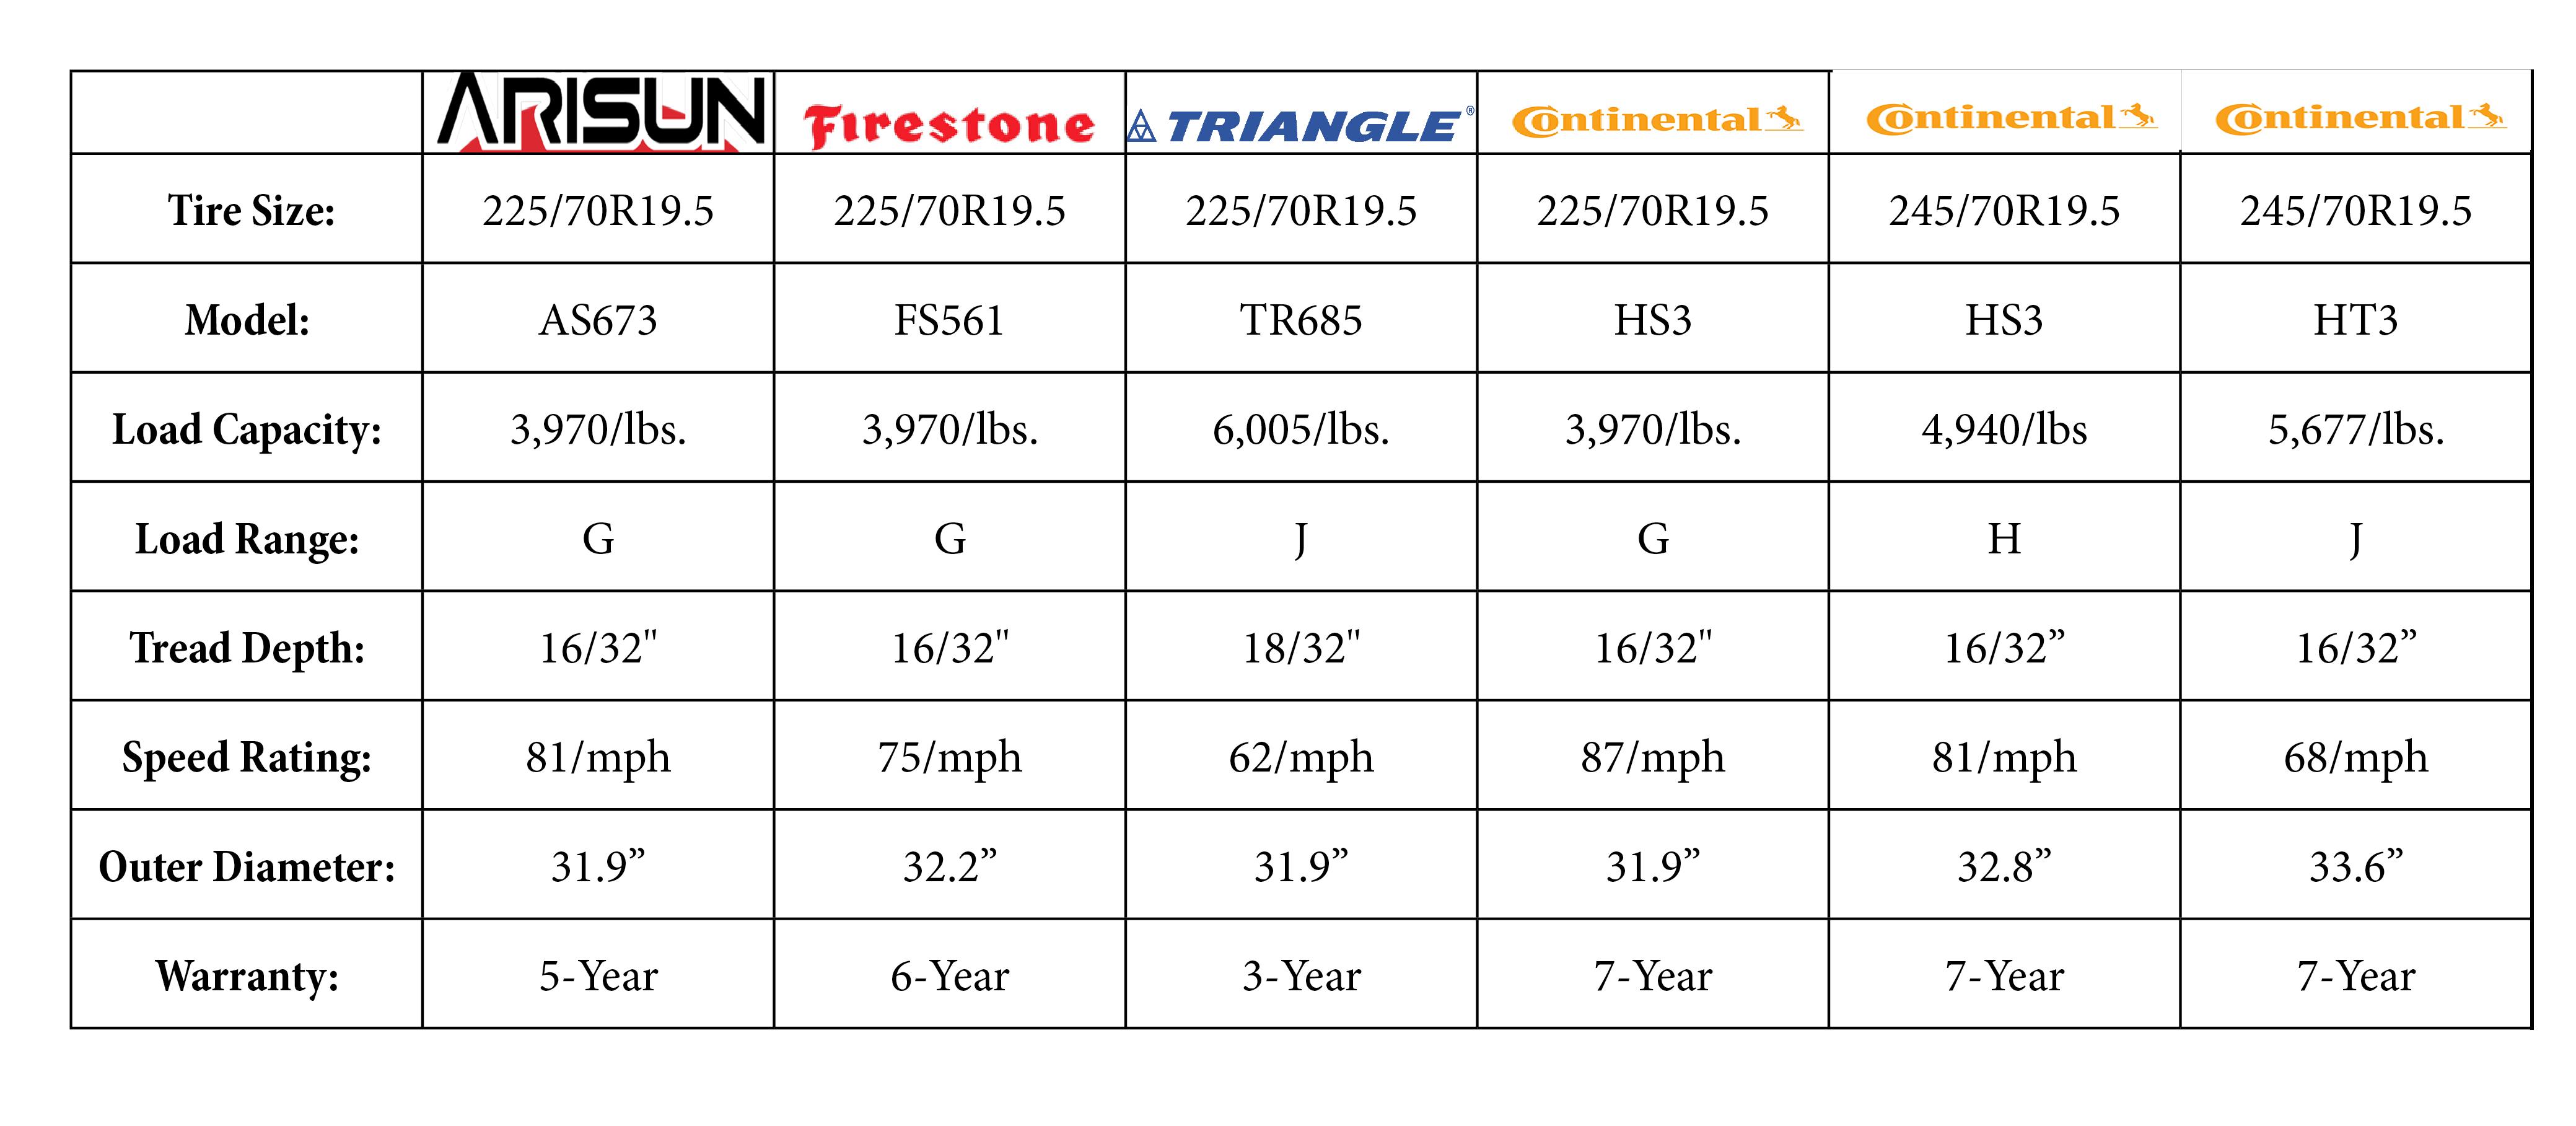 tire-chart-arisun-triangle-conti-firestone-2-expanded.png